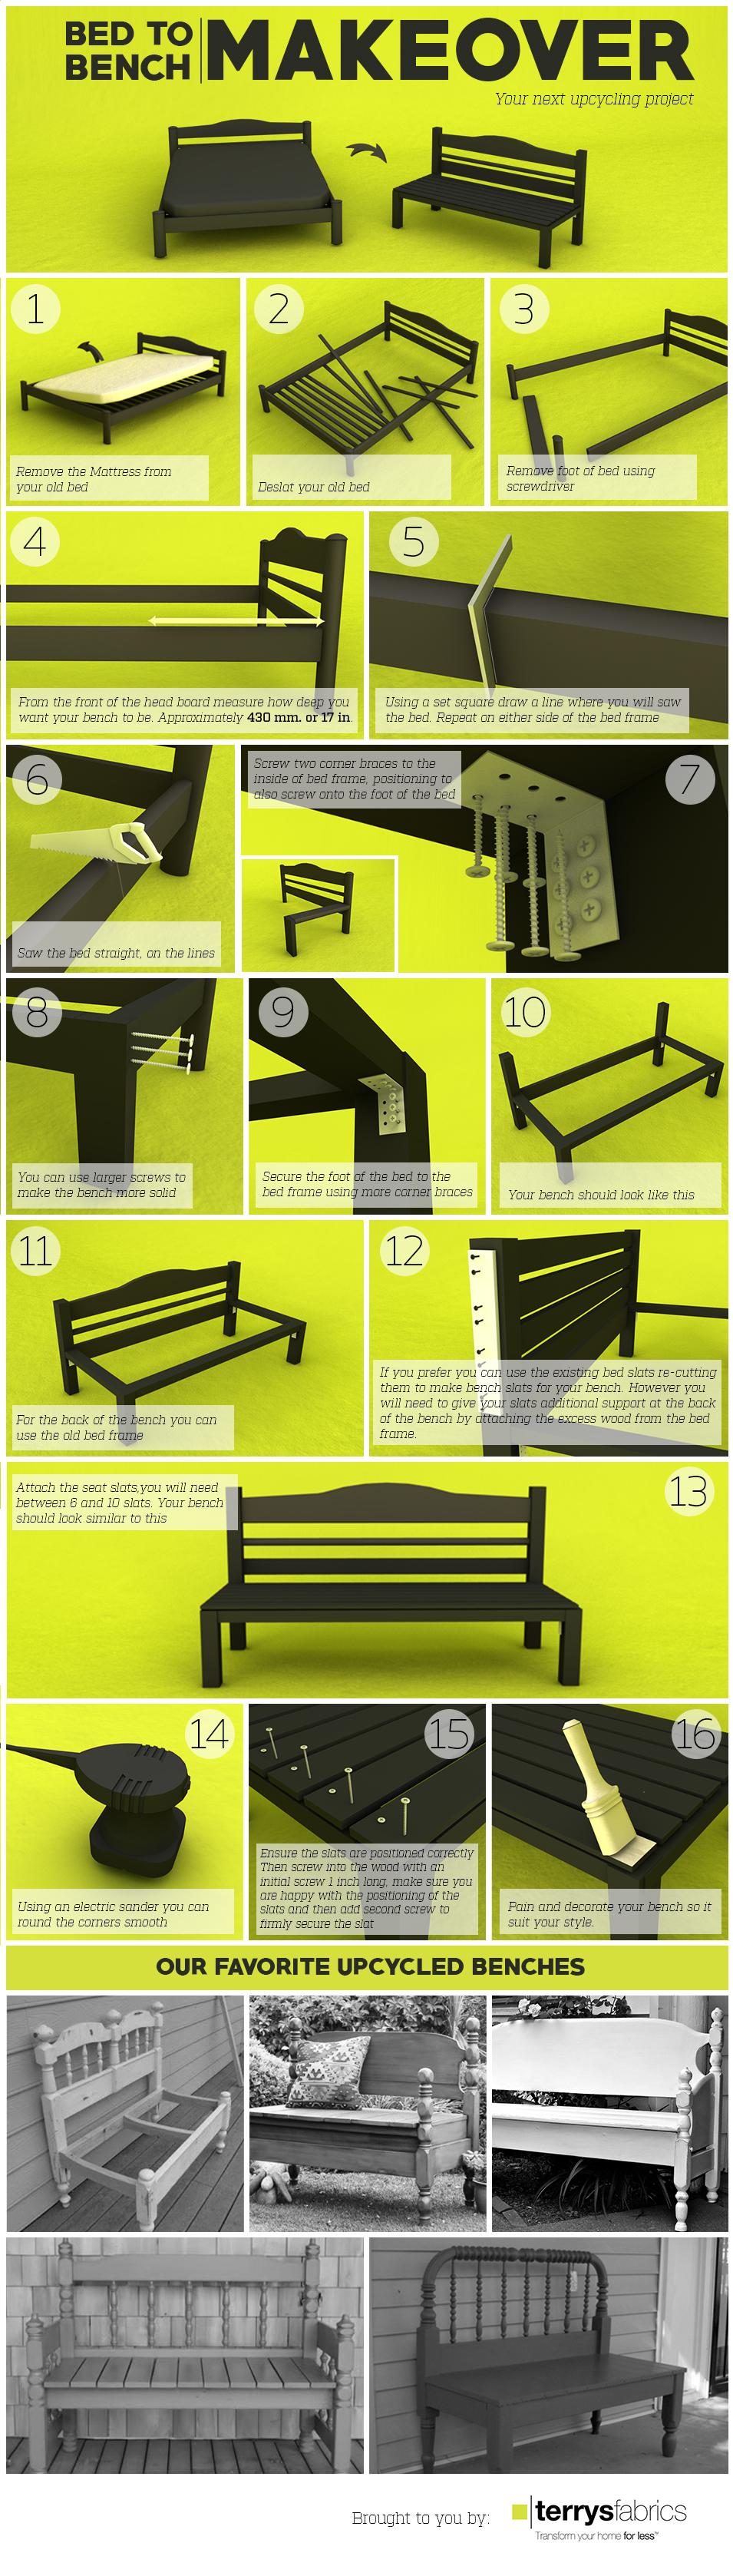 DIY Headboard Bench How-to